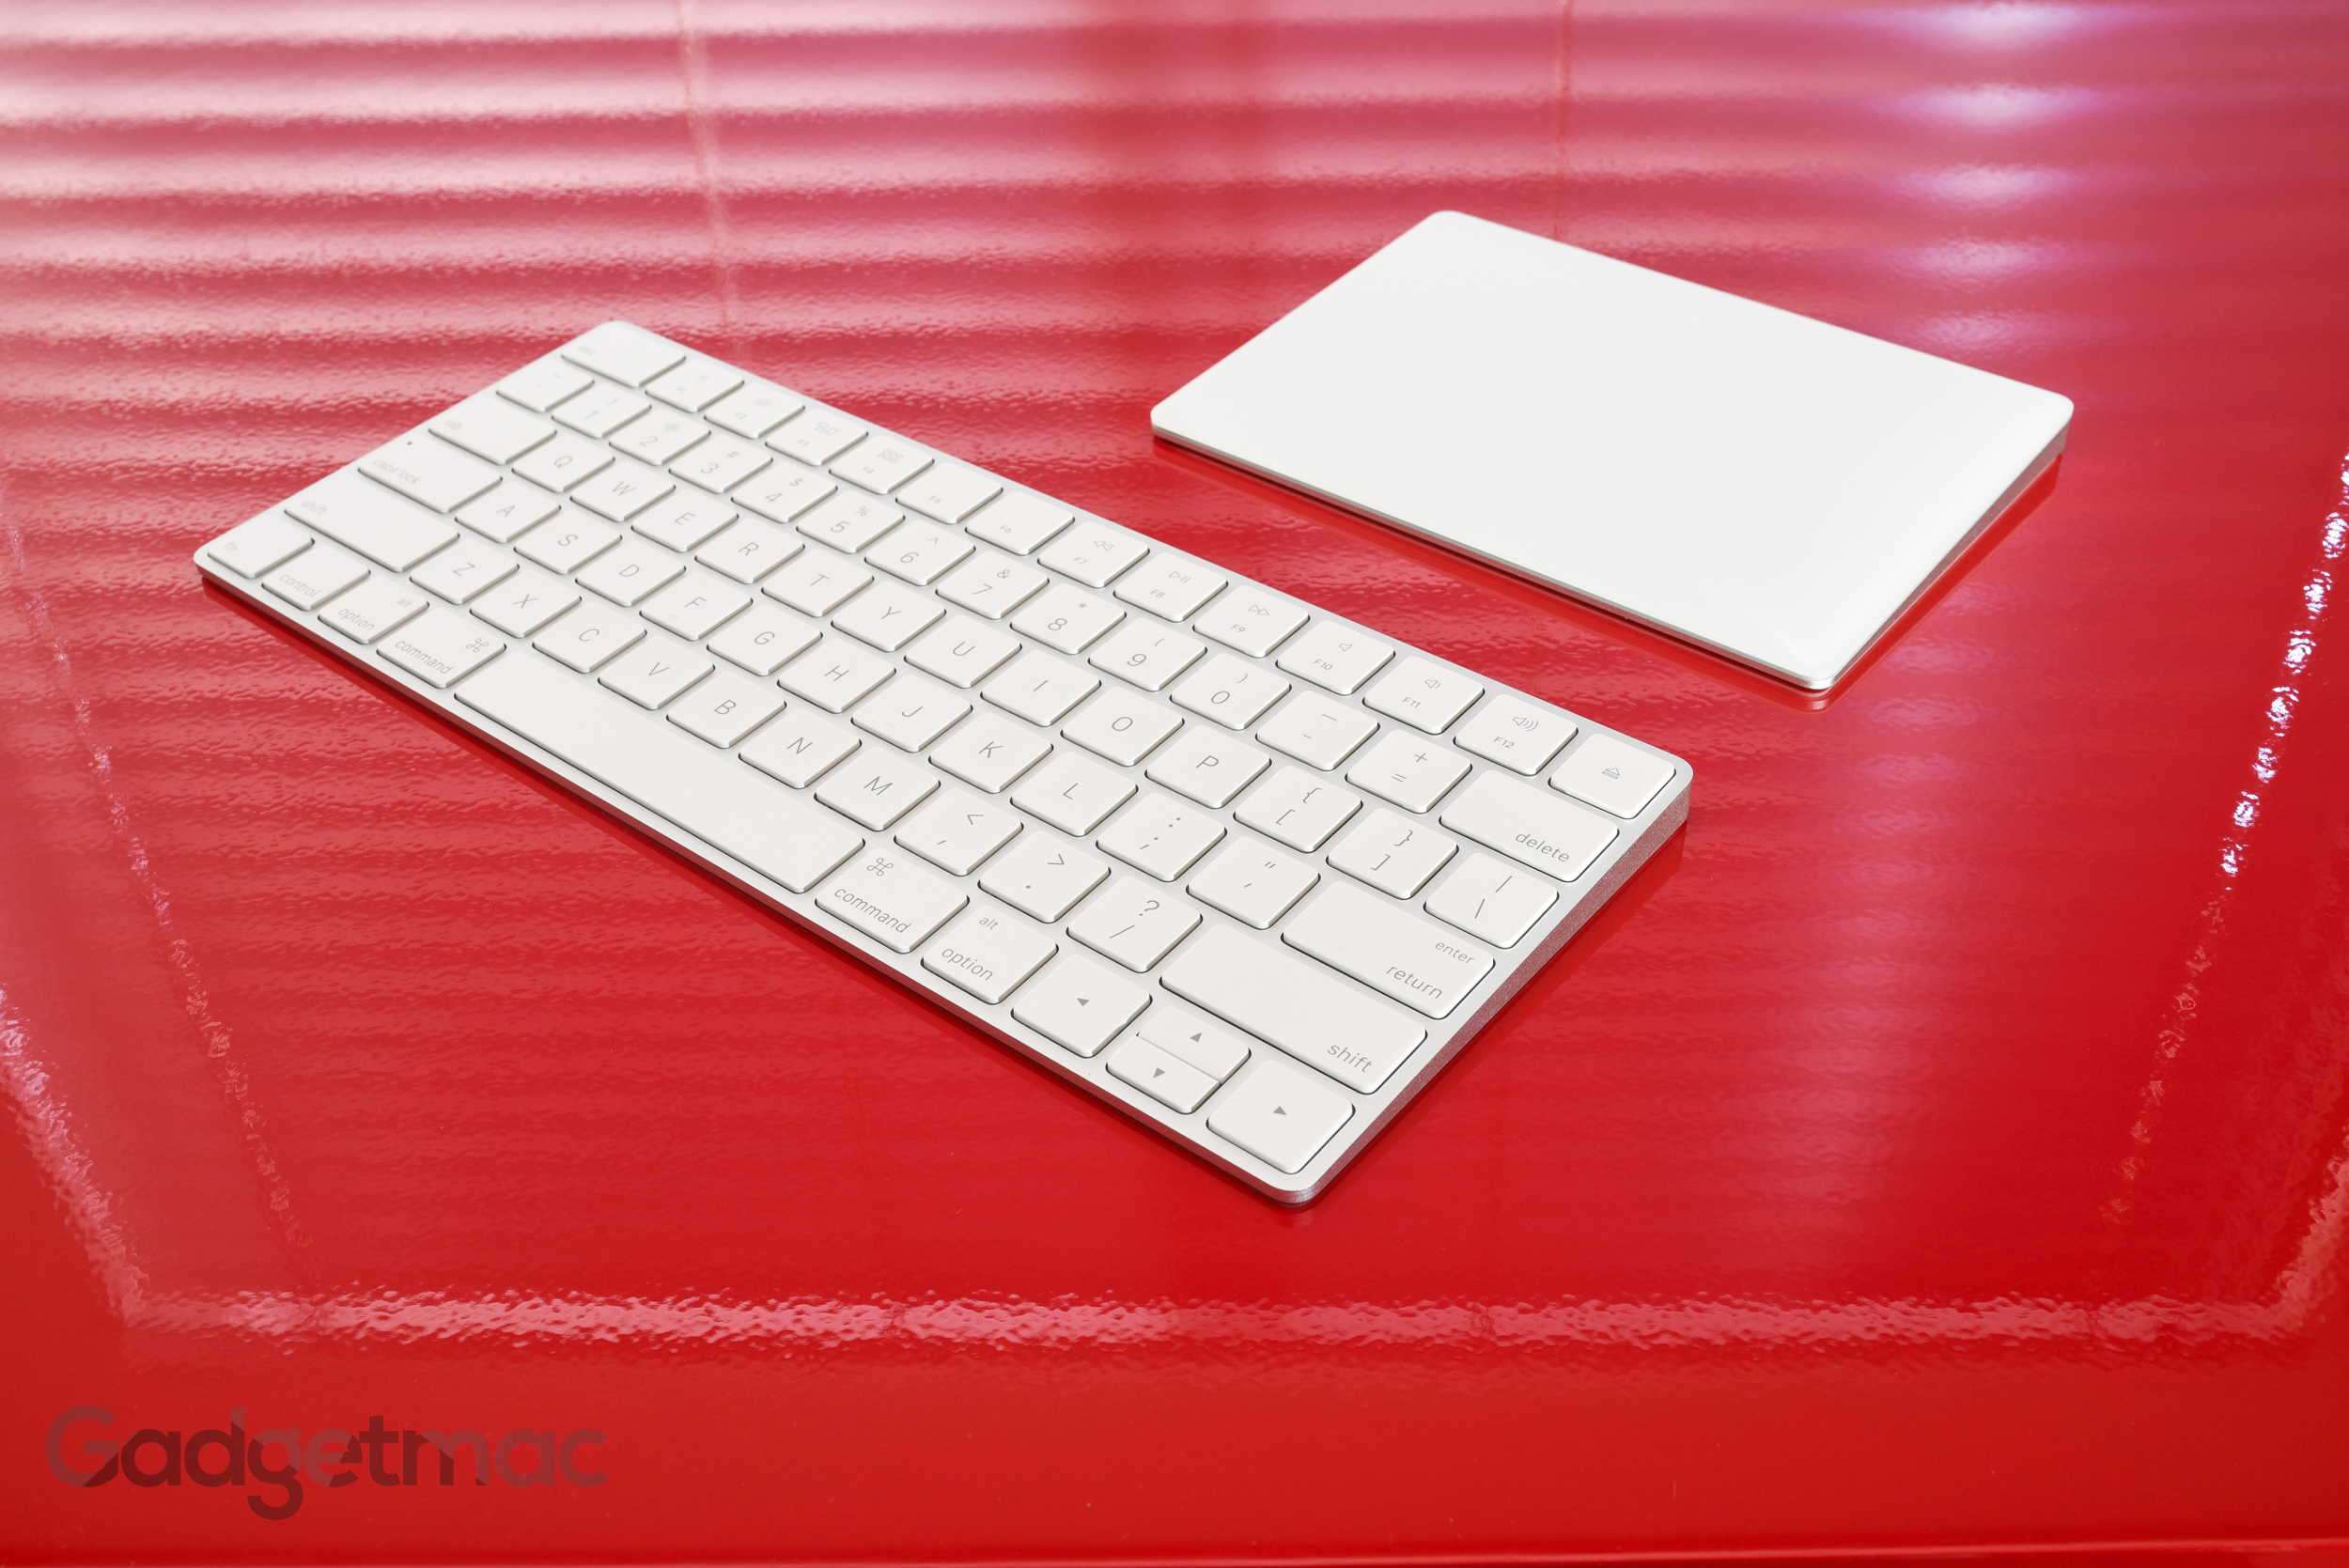 apple-magic-keybaord-side-profile.jpg